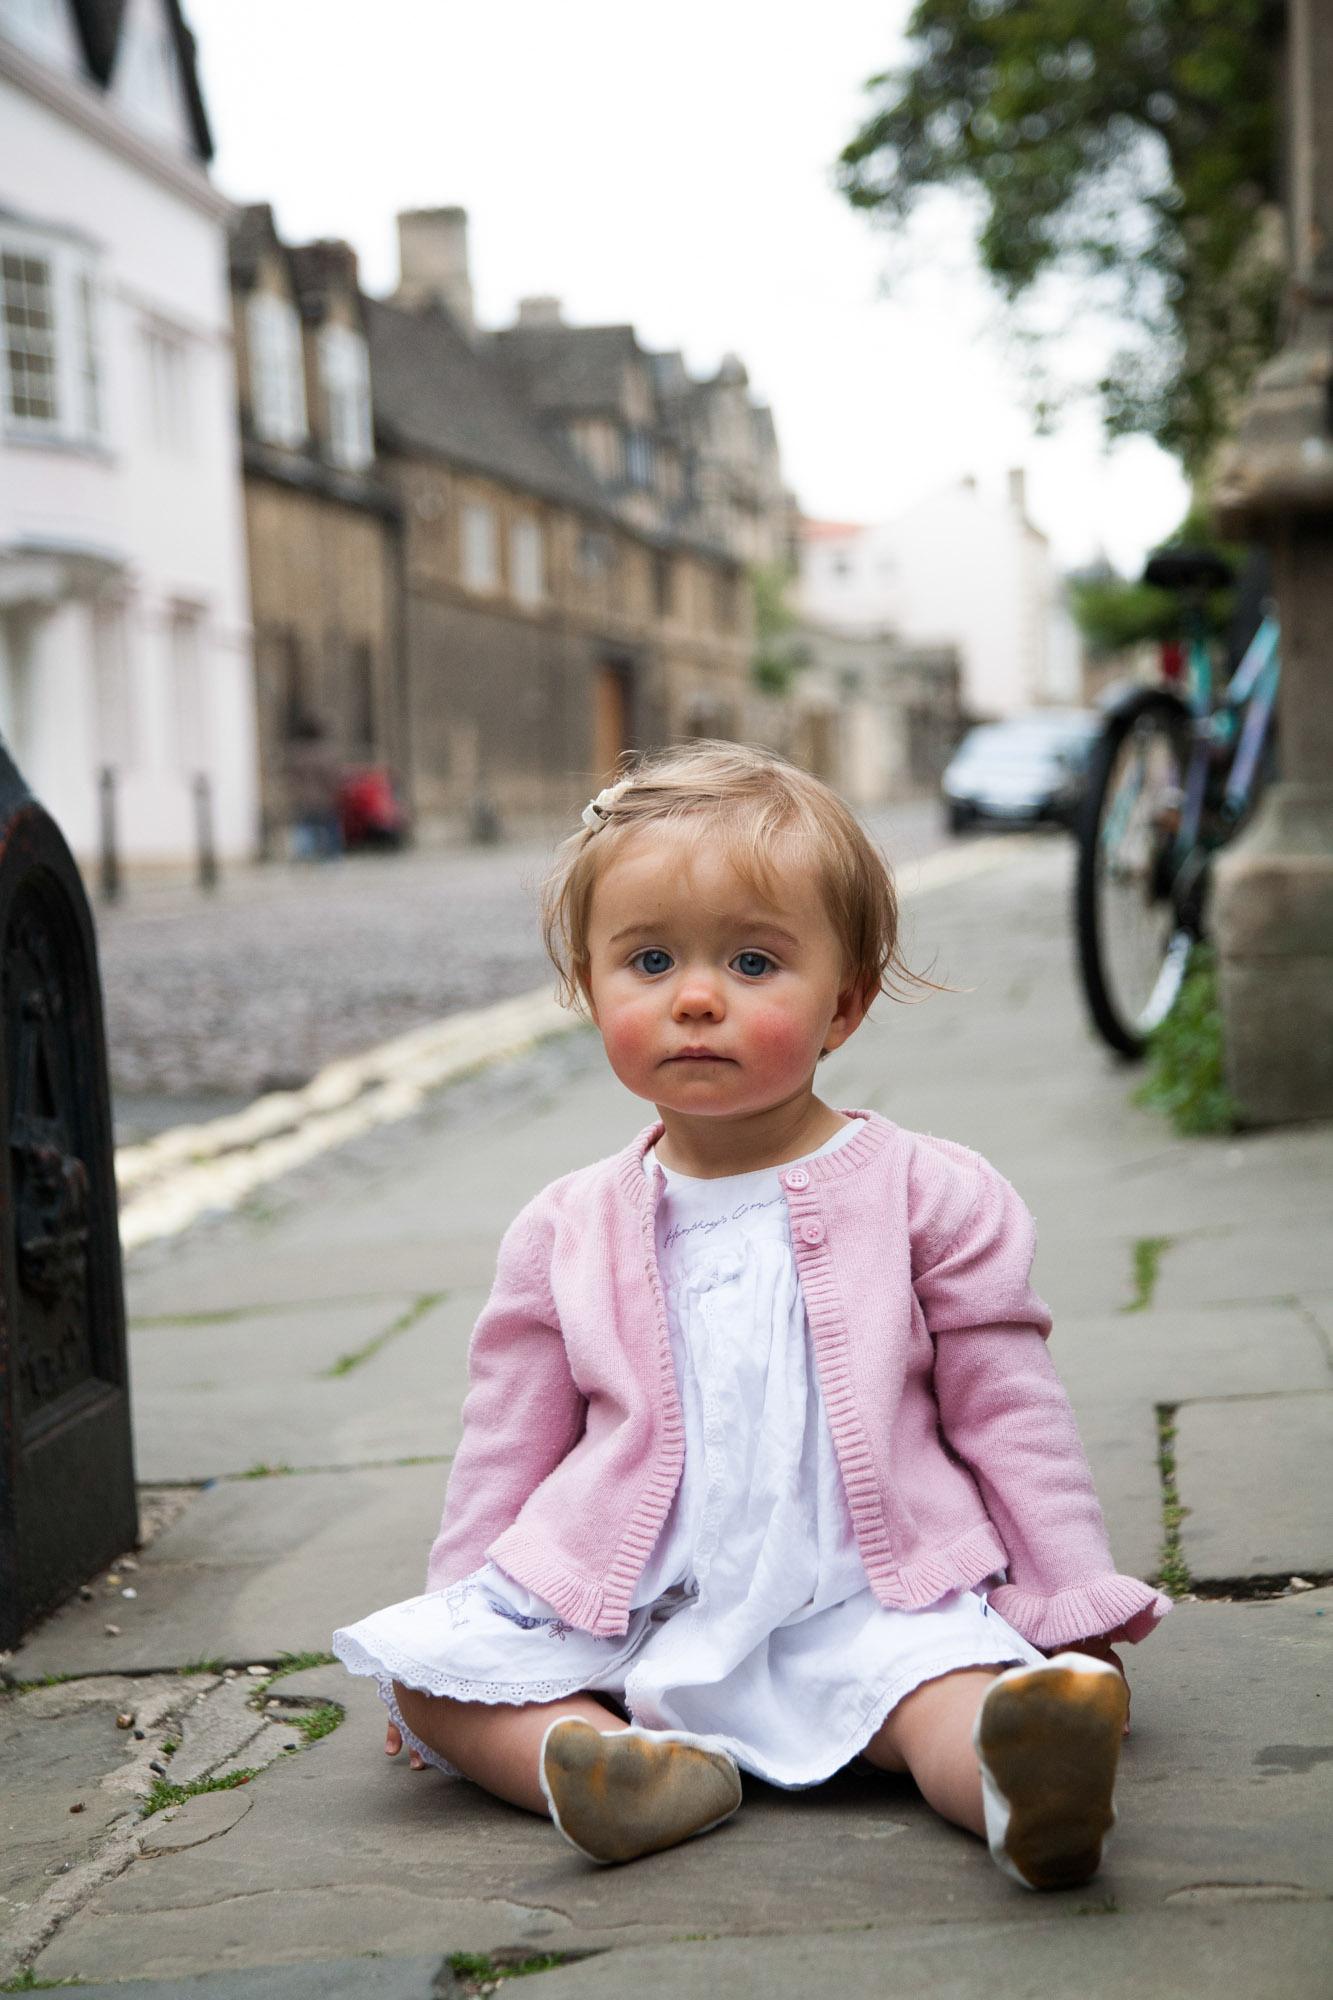 family-life-family-photographer-oxford-london-jonathan-self-photography-1.jpg